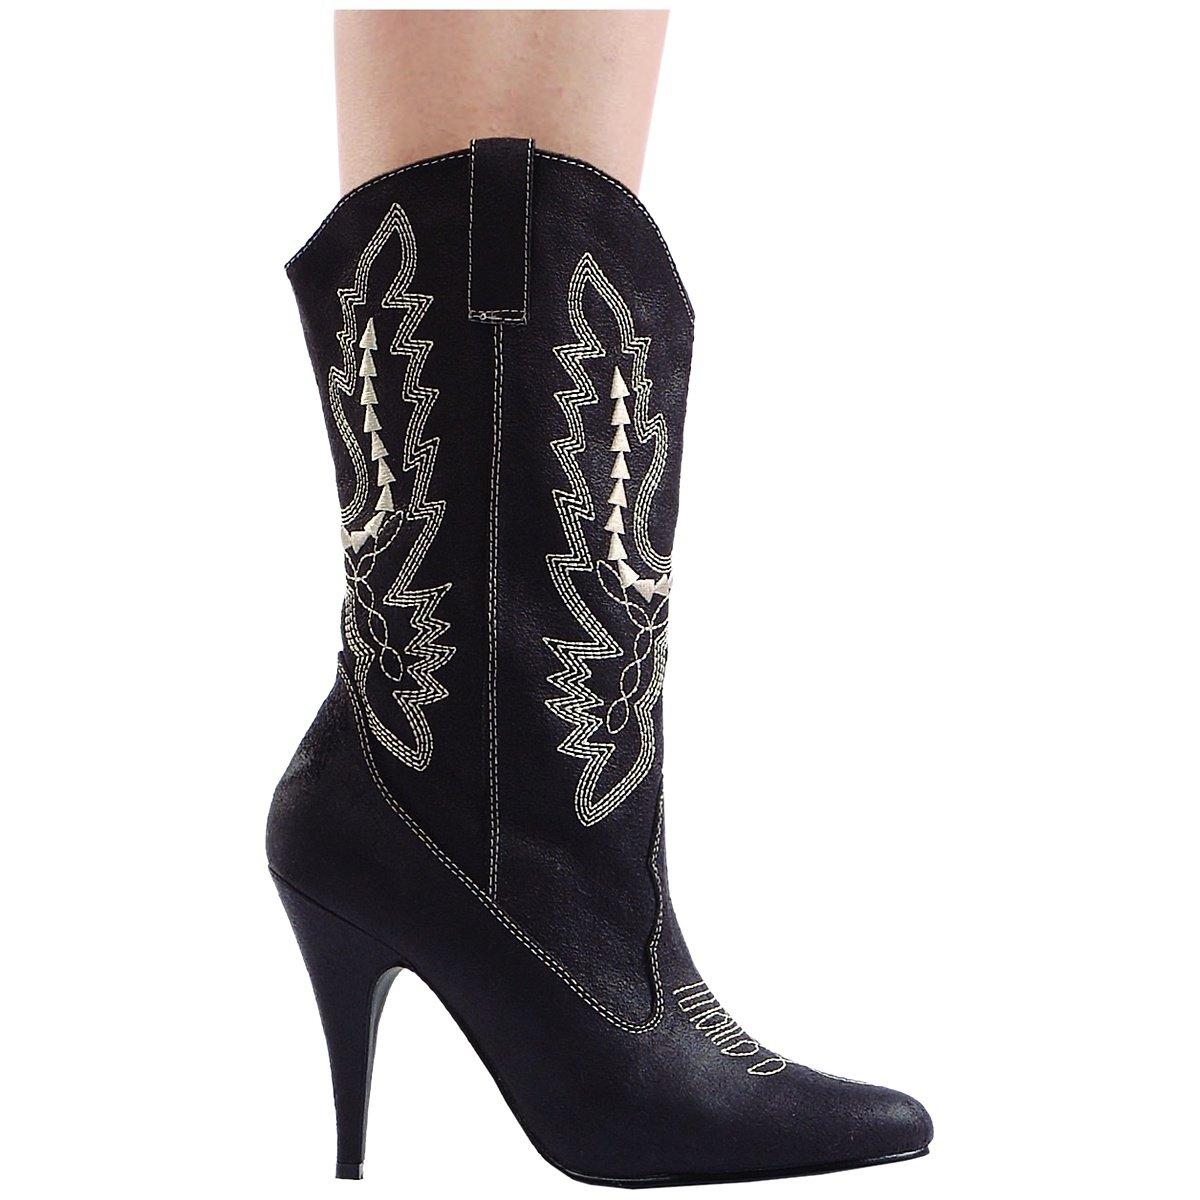 Ellie Shoes Women's 418-Cowgirl Western Boot B005GJDJ7Q 8 M US Big Kid Multicoloured